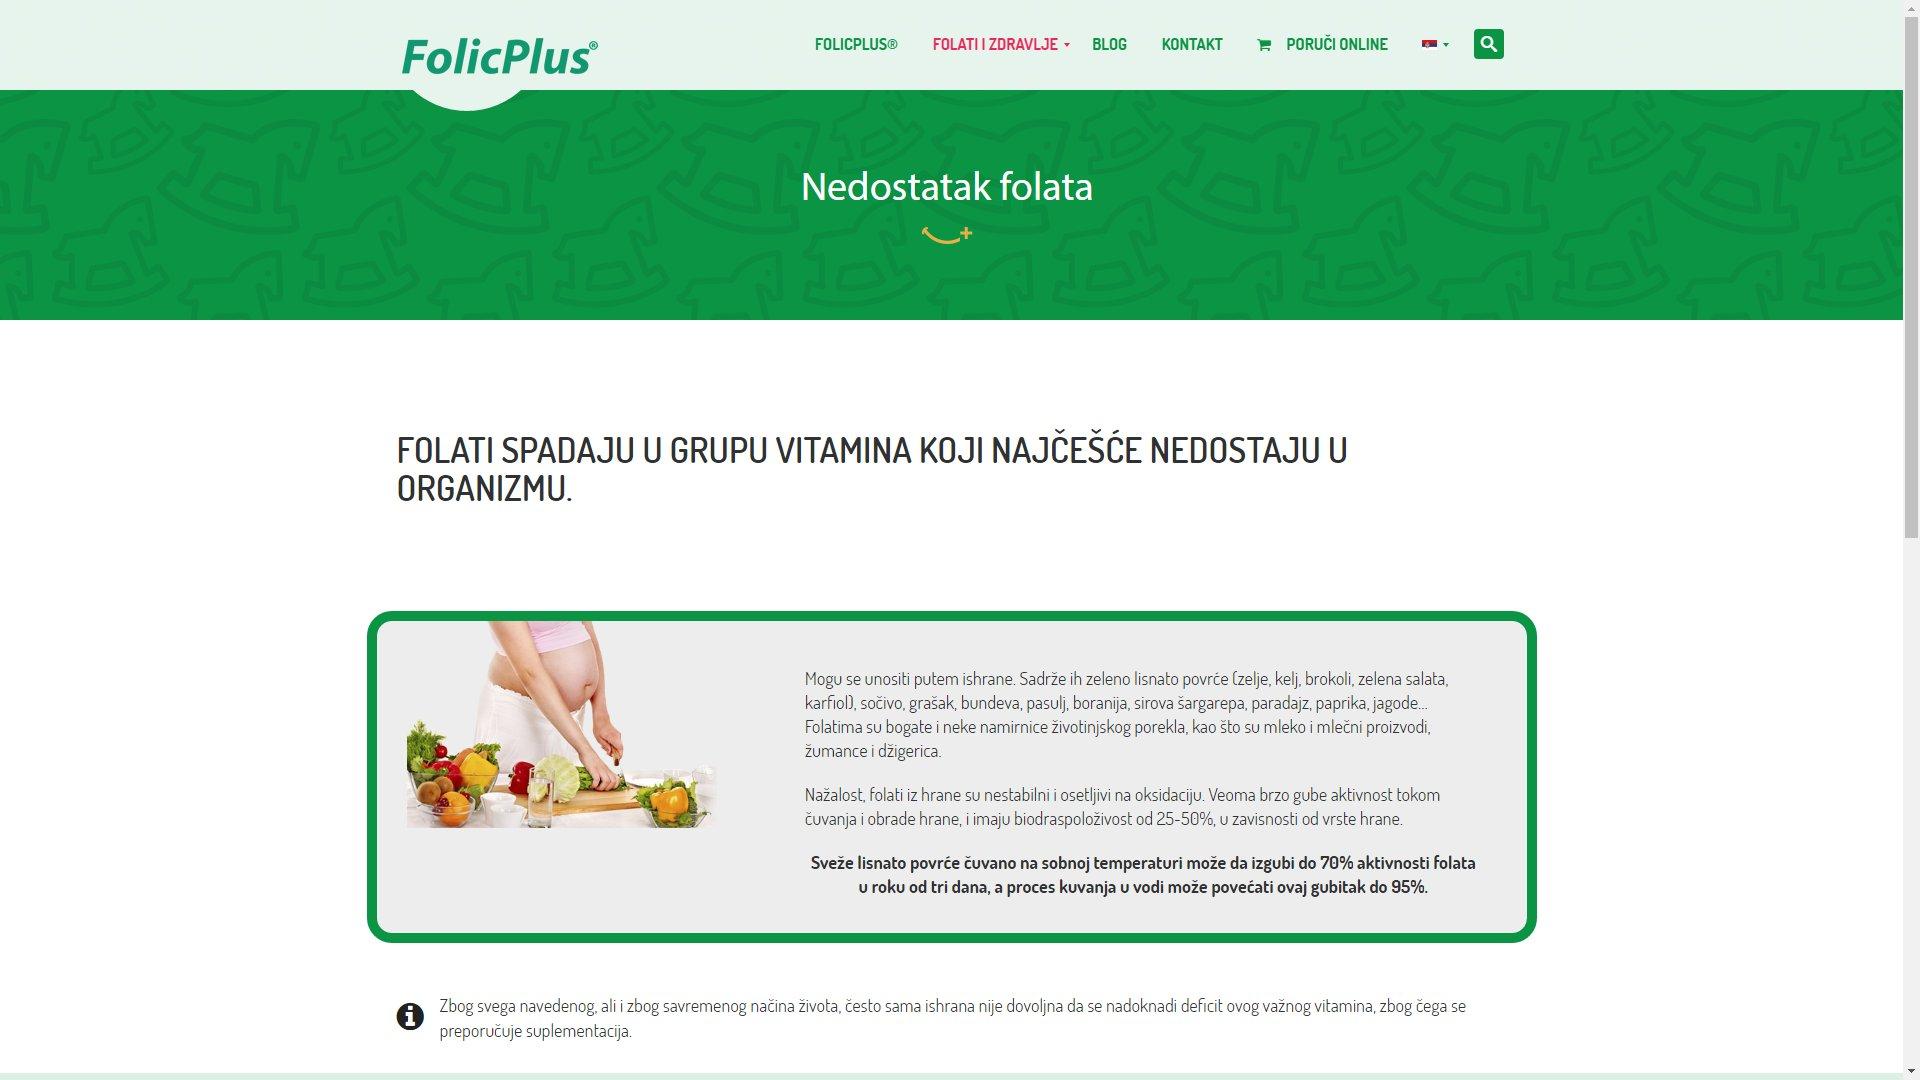 Folic Plus website - ss6